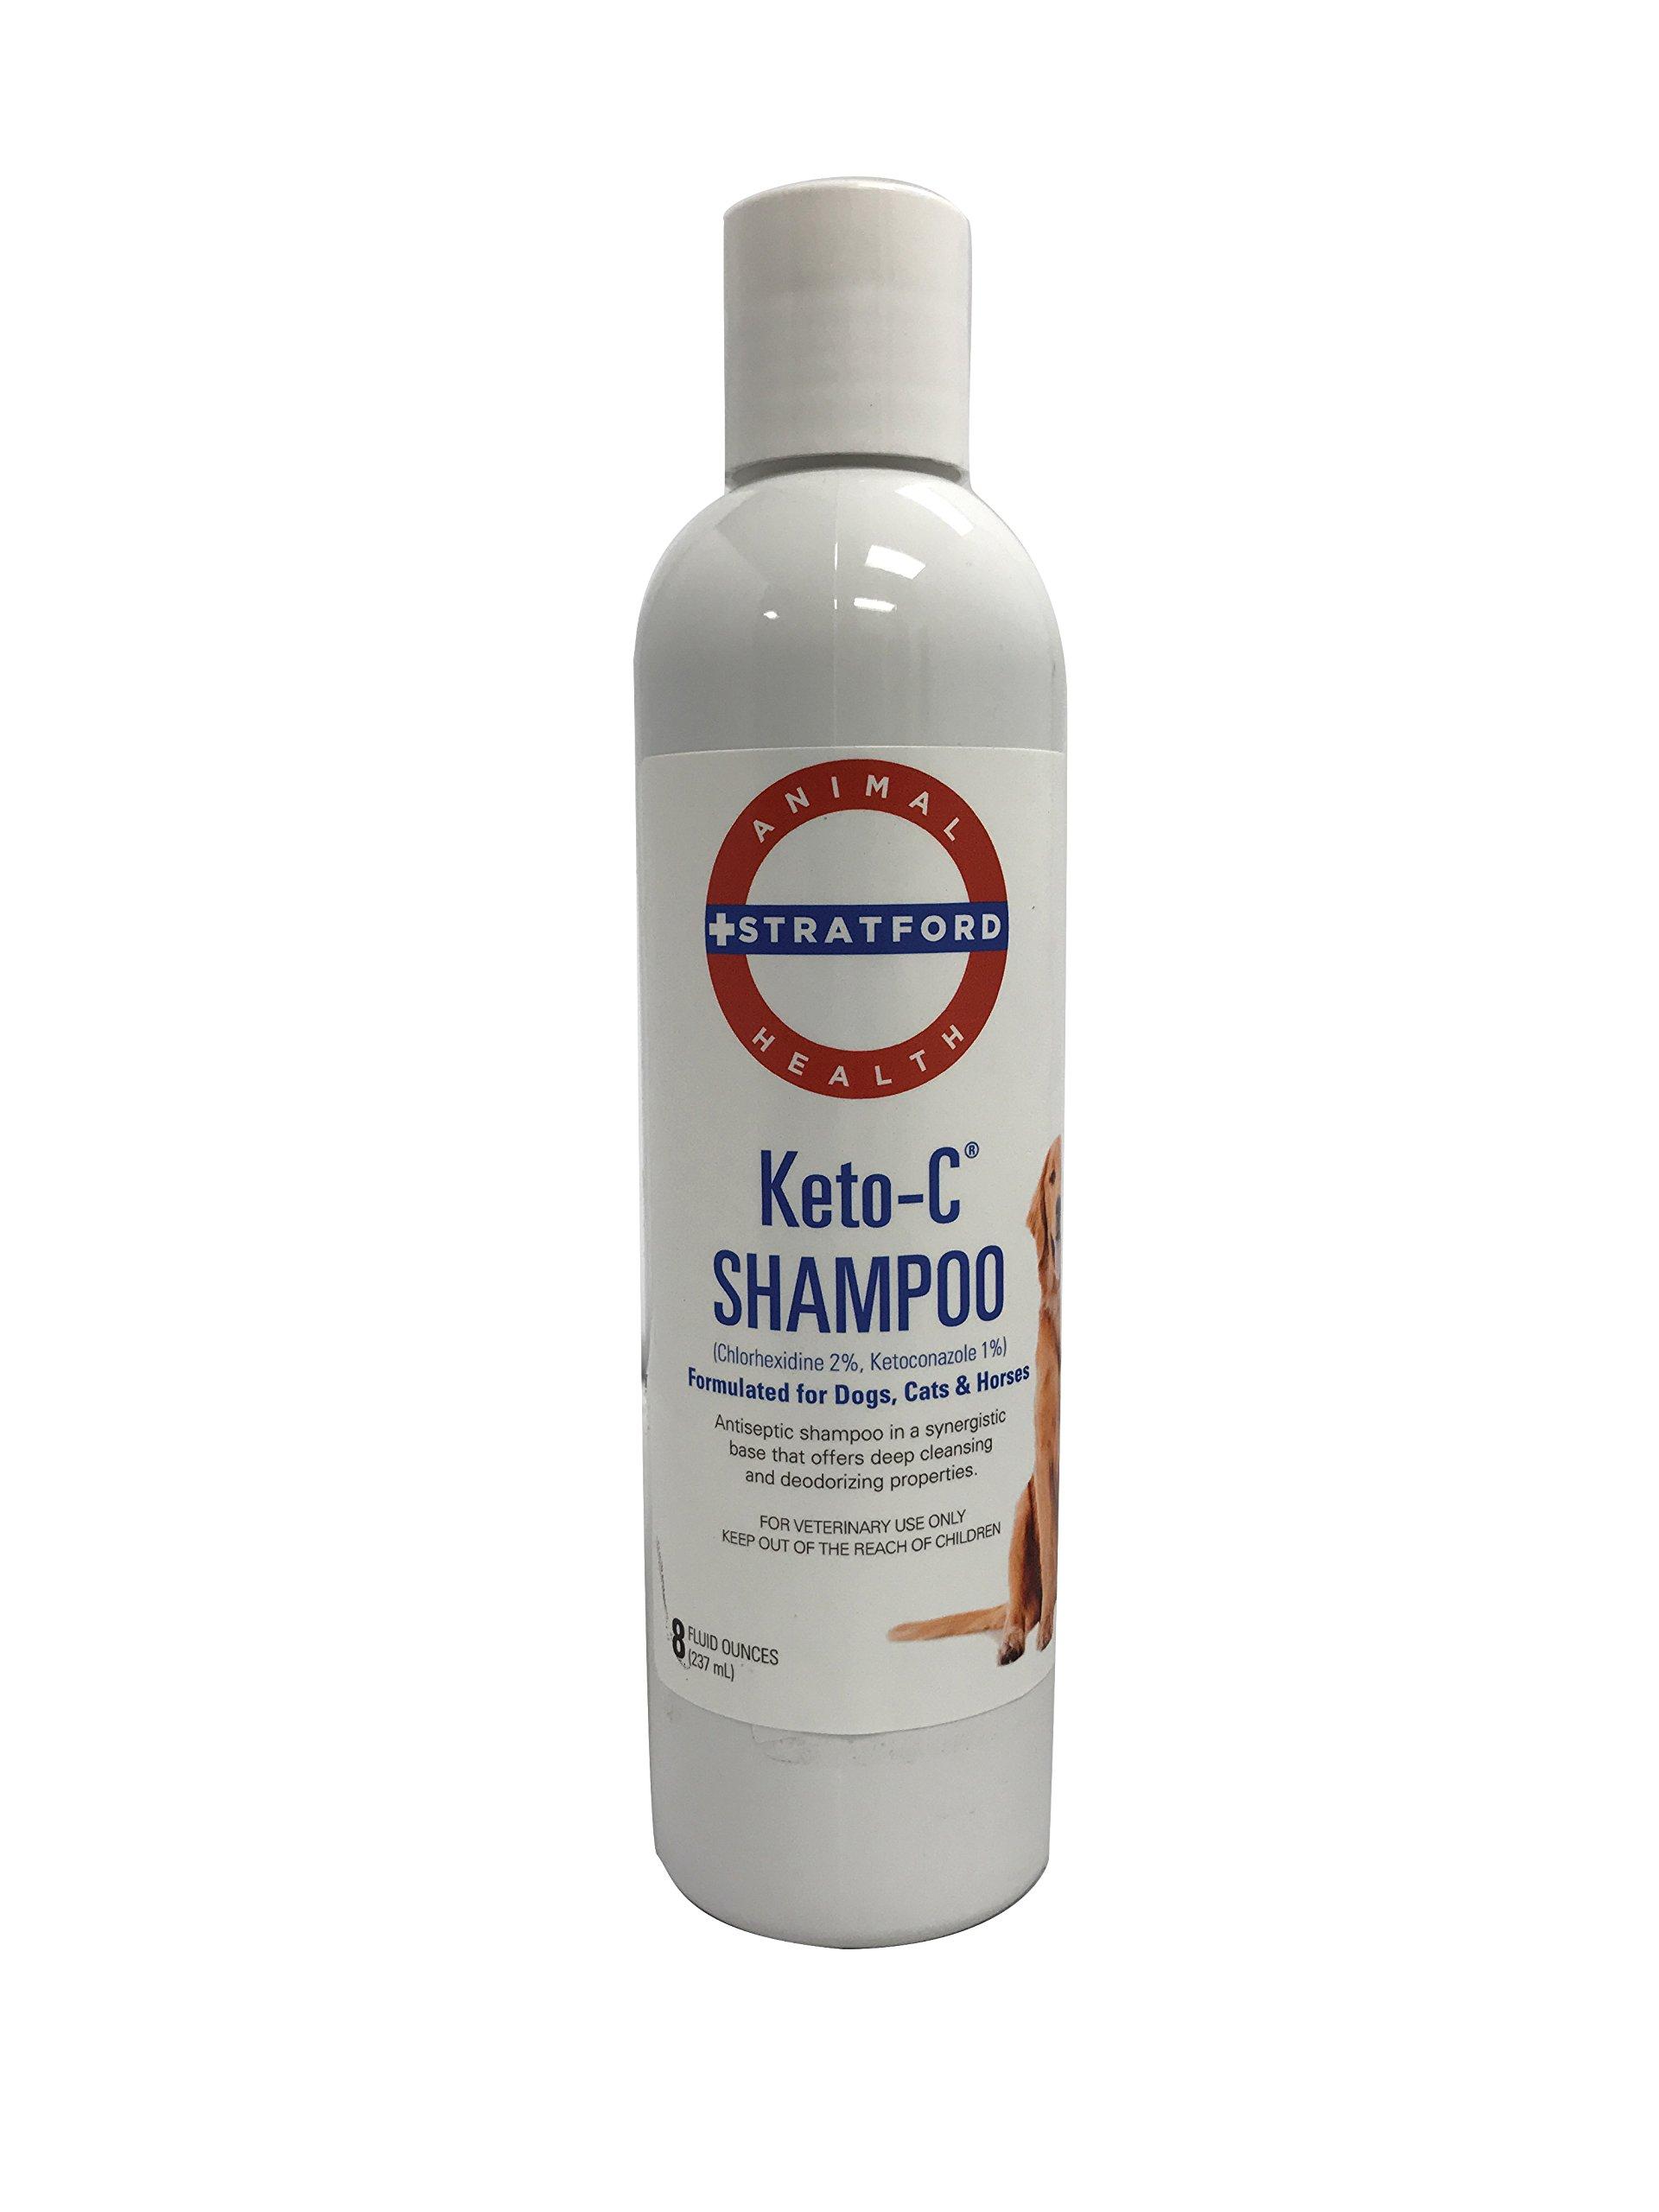 Stratford Pharmaceuticals Keto-C Medicated Dog Shampoo, 8 oz - Cucumber Melon